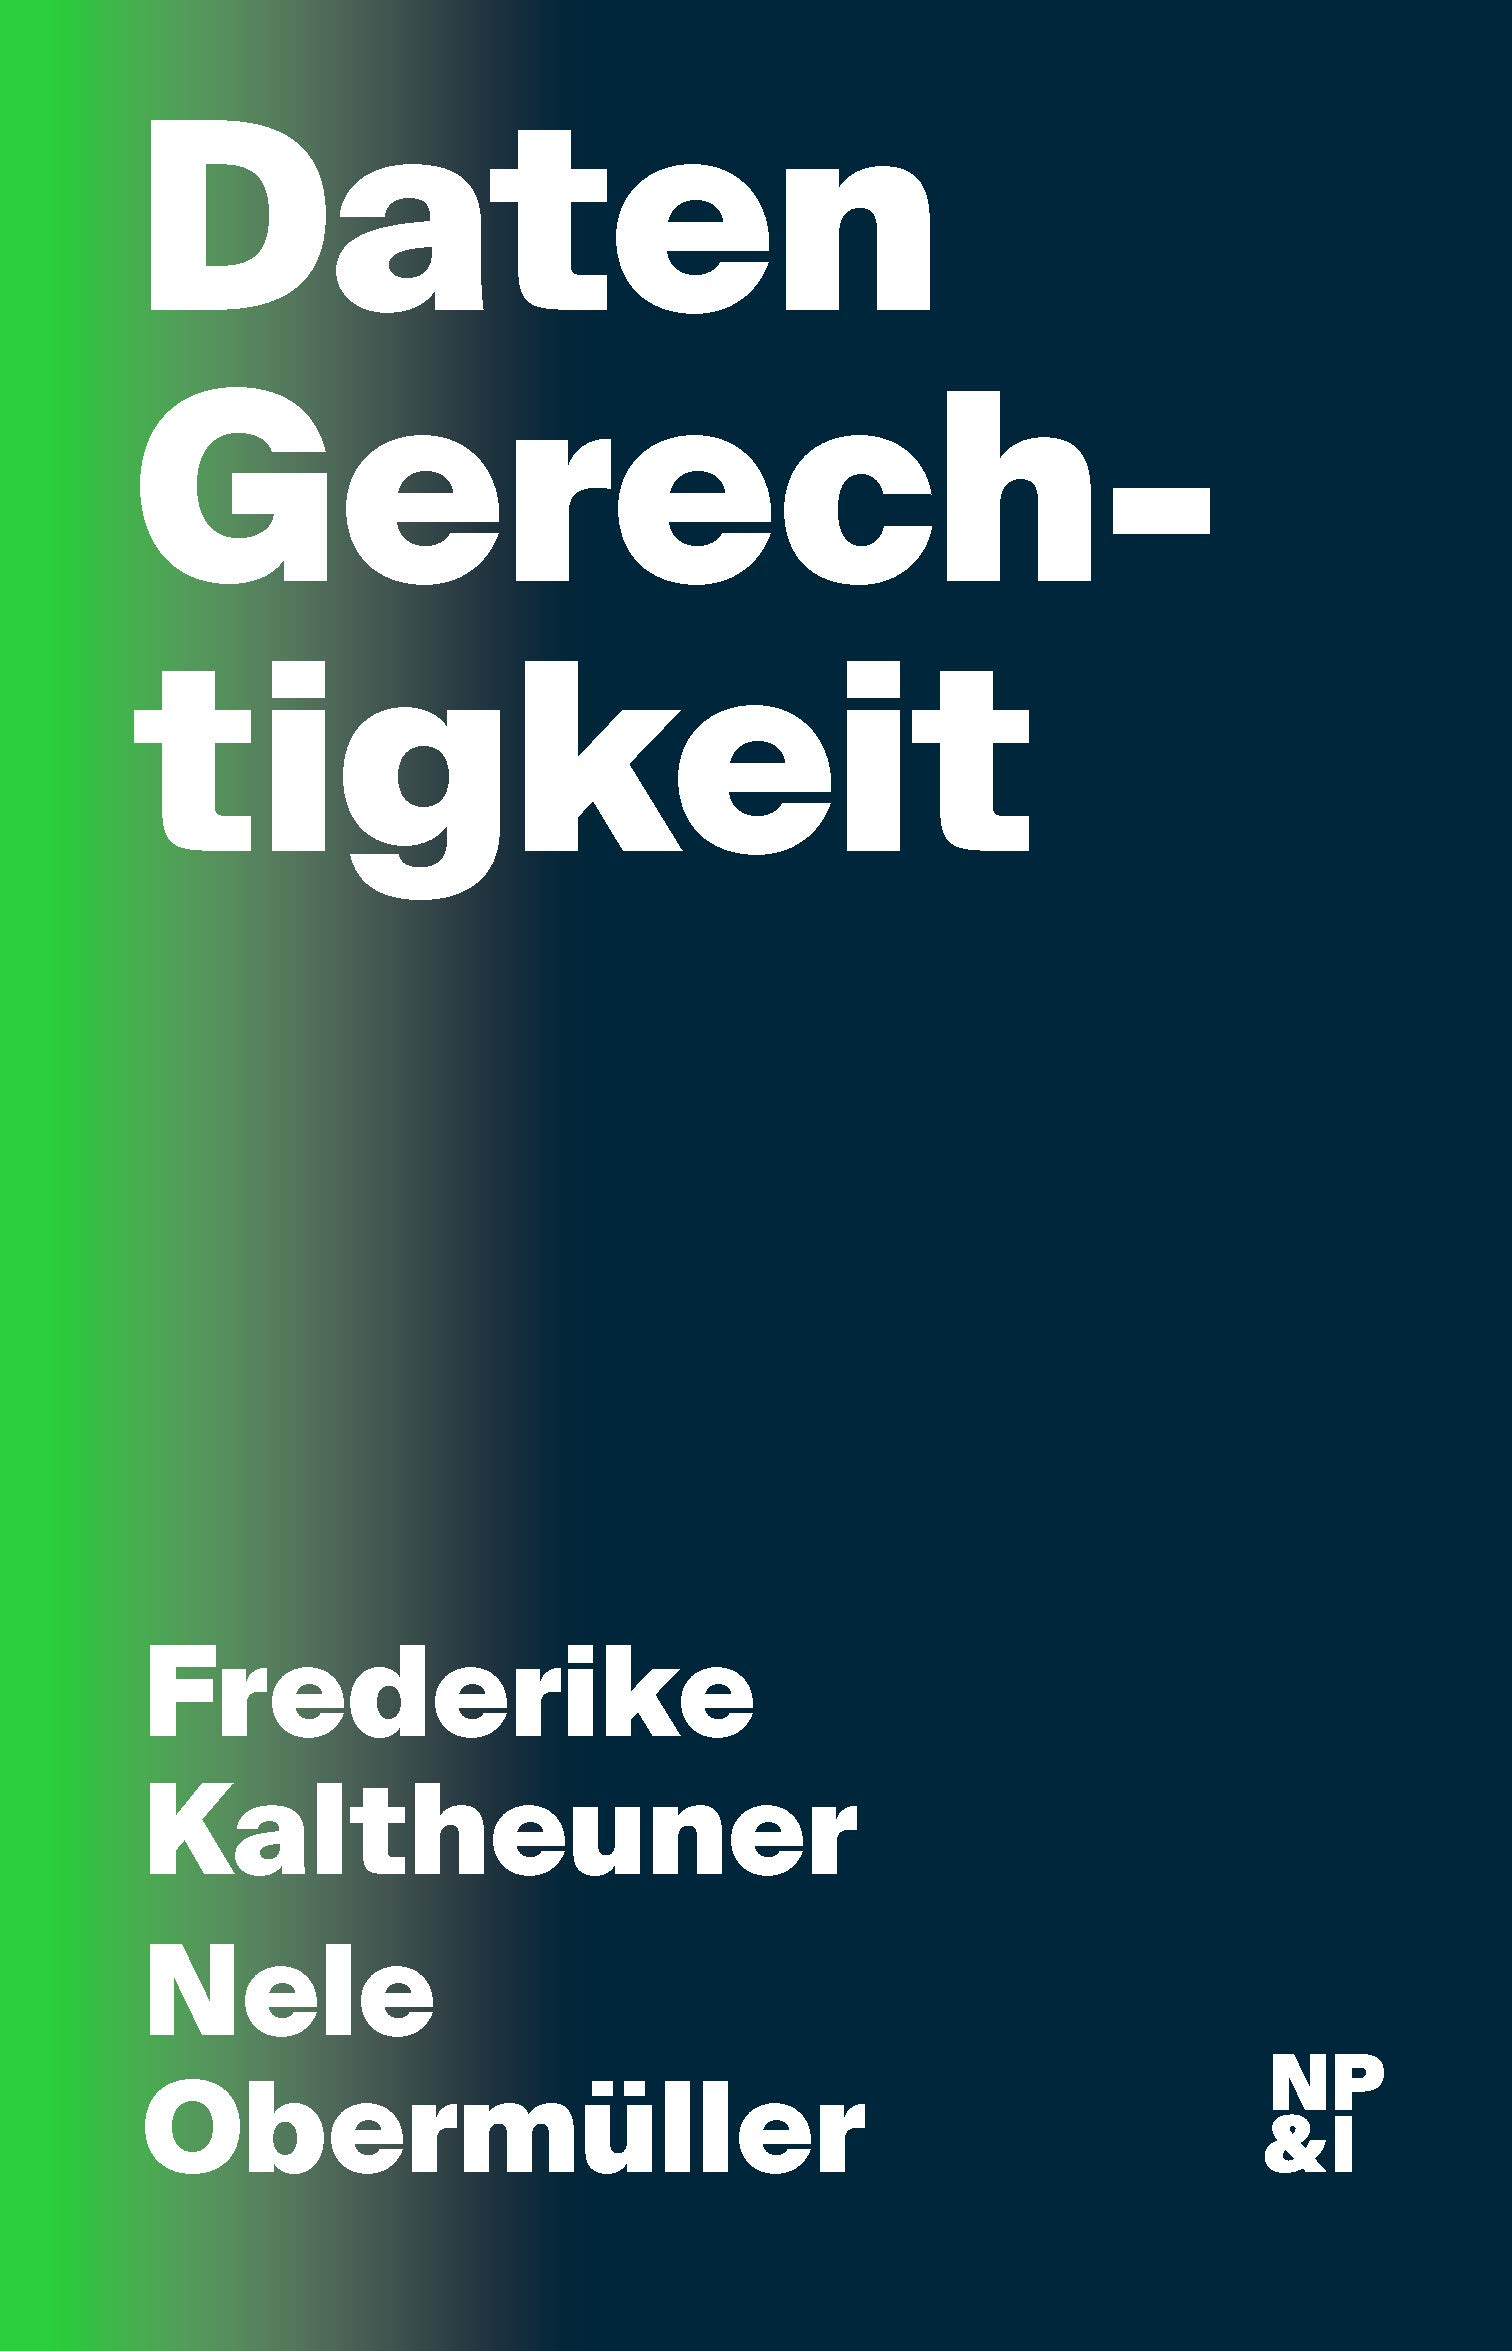 DatenGerechtigkeit Gebundenes Buch – 23. Oktober 2018 Frederike Kaltheuner Nele Obermüller 3964760110 SOCIAL SCIENCE / Essays